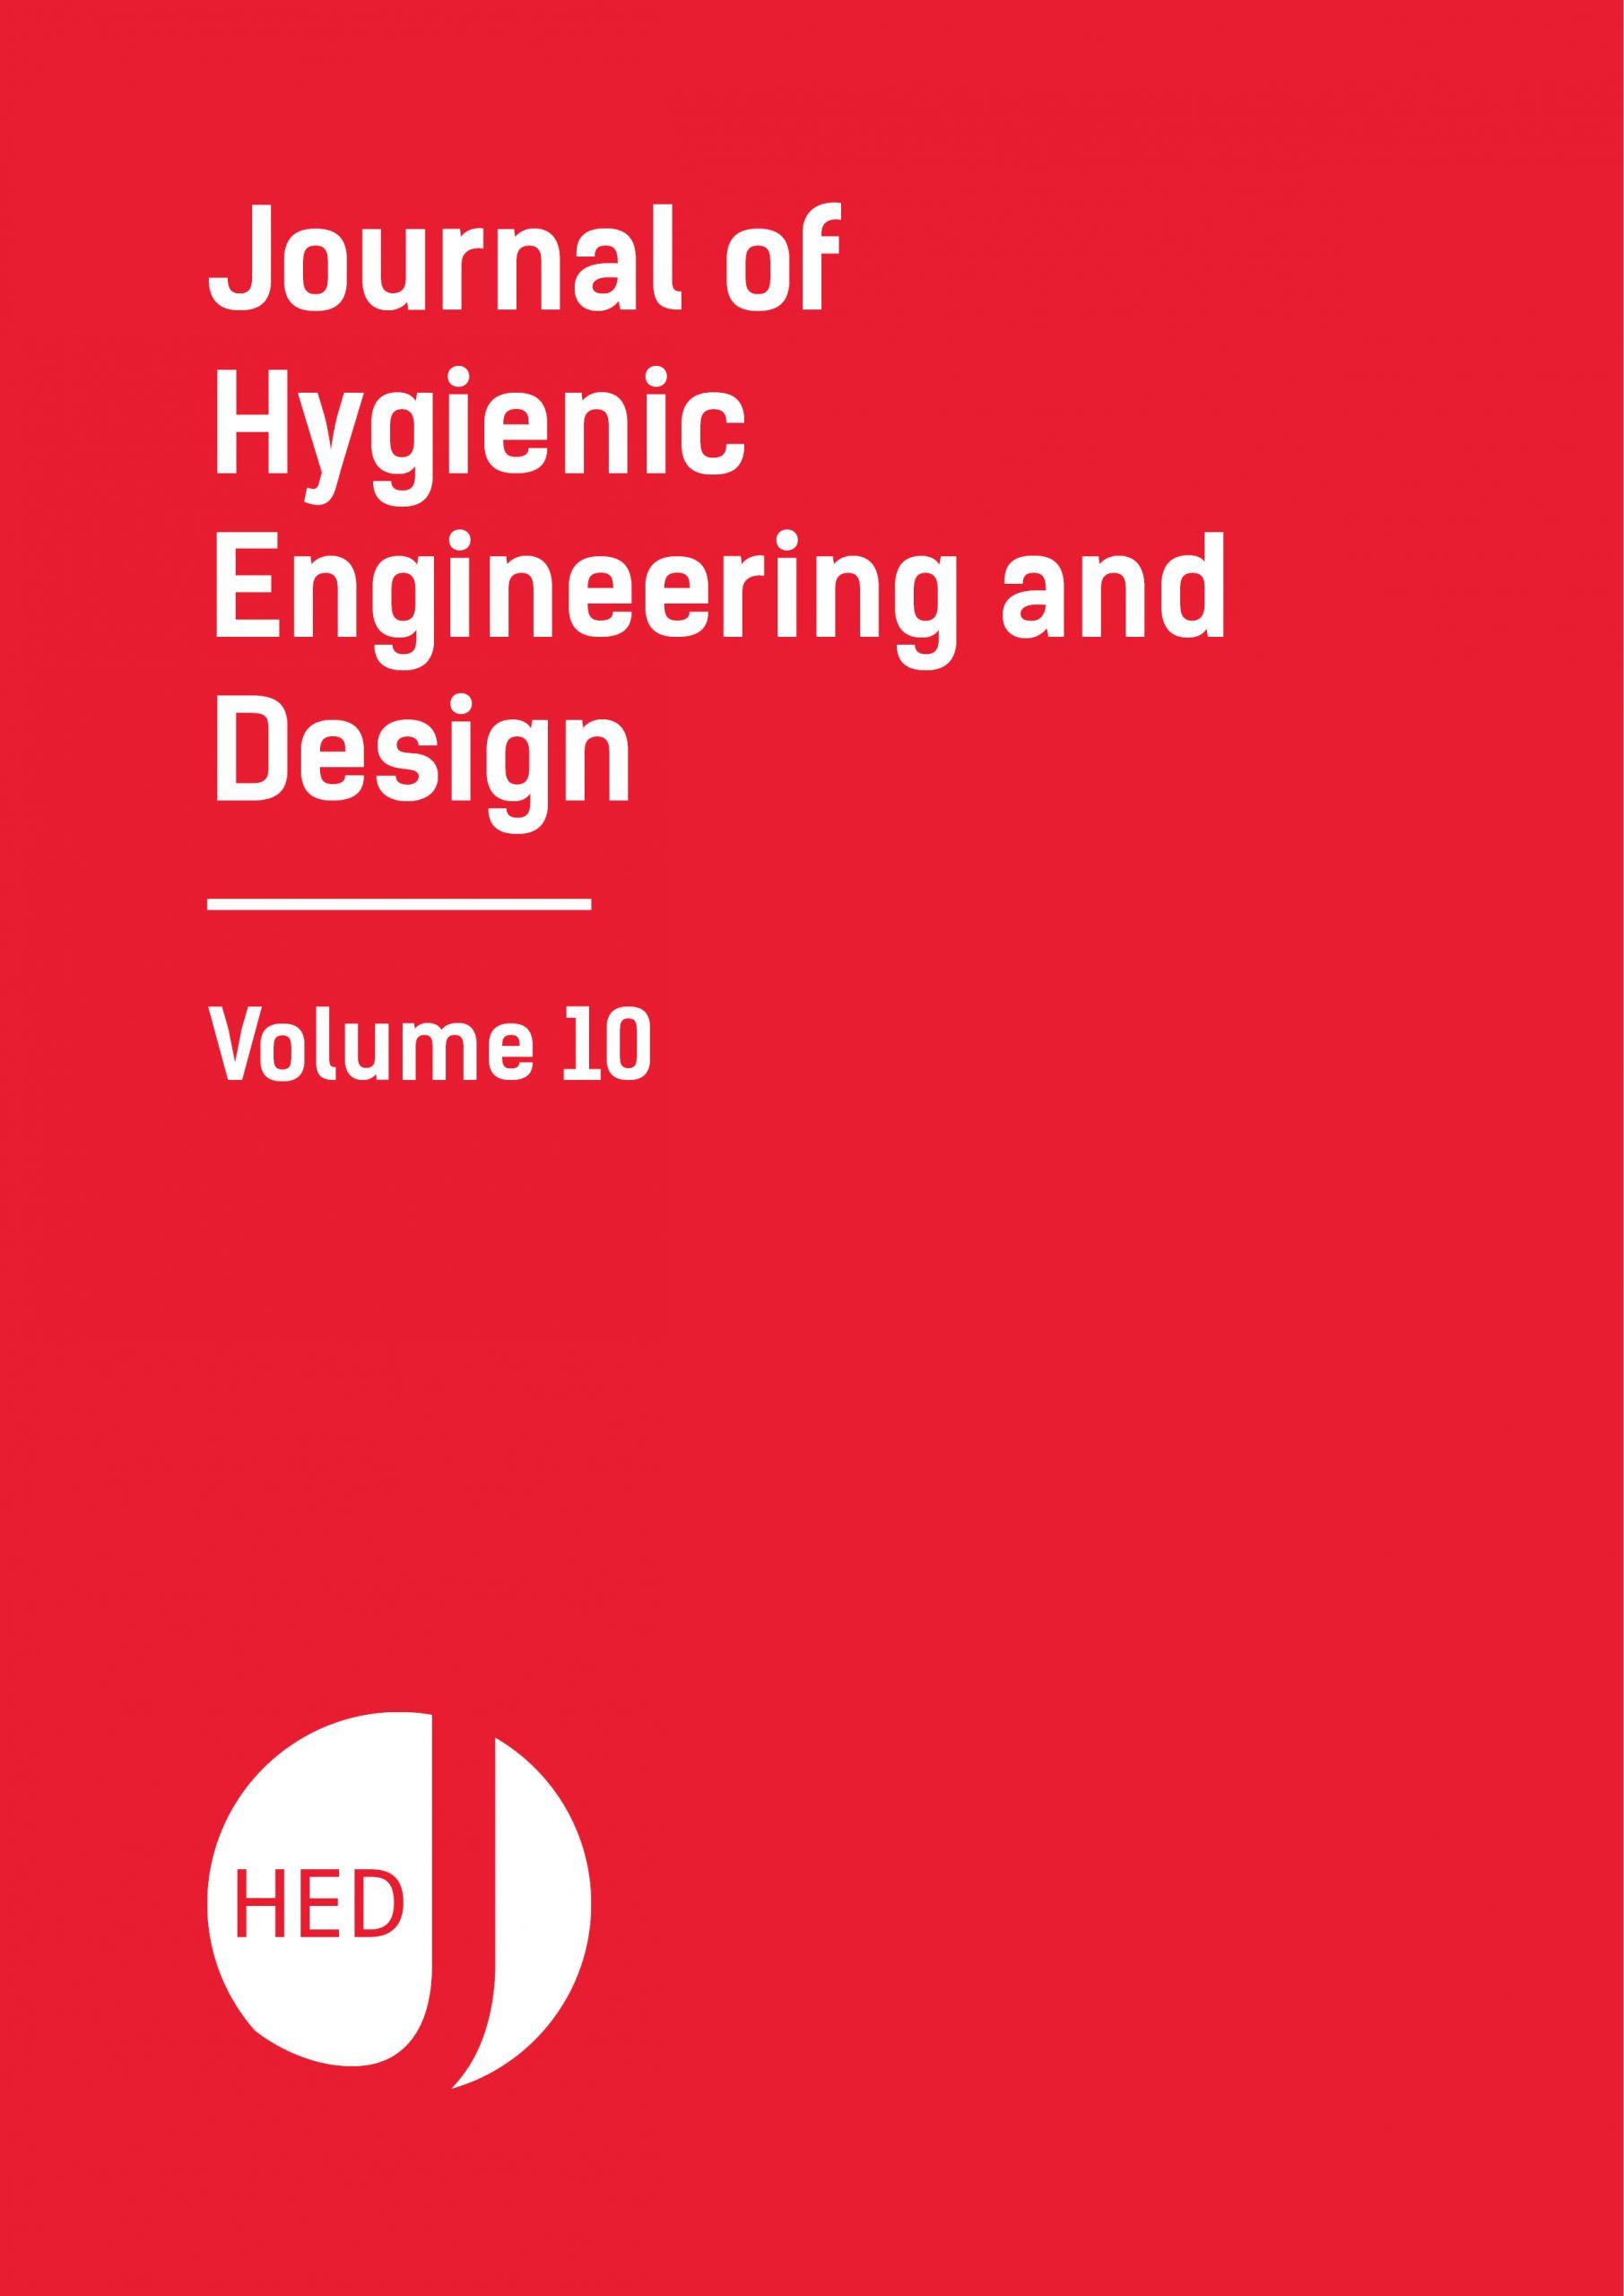 JHED Volume 10